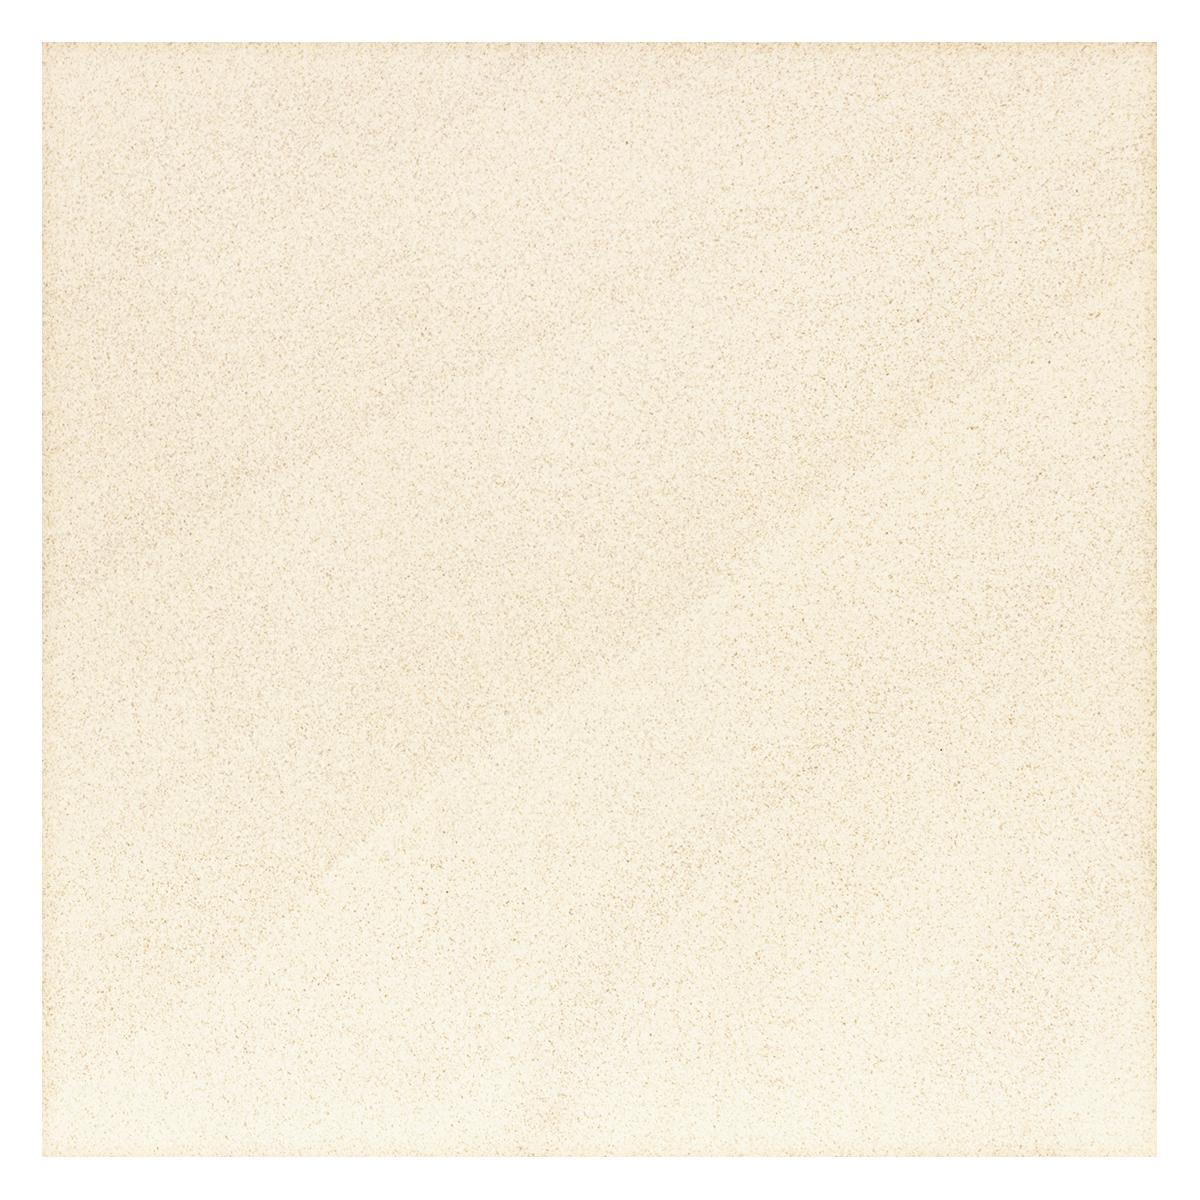 Porcelanato Merida Beige Brillante - 60X60 cm - 1.44 m2